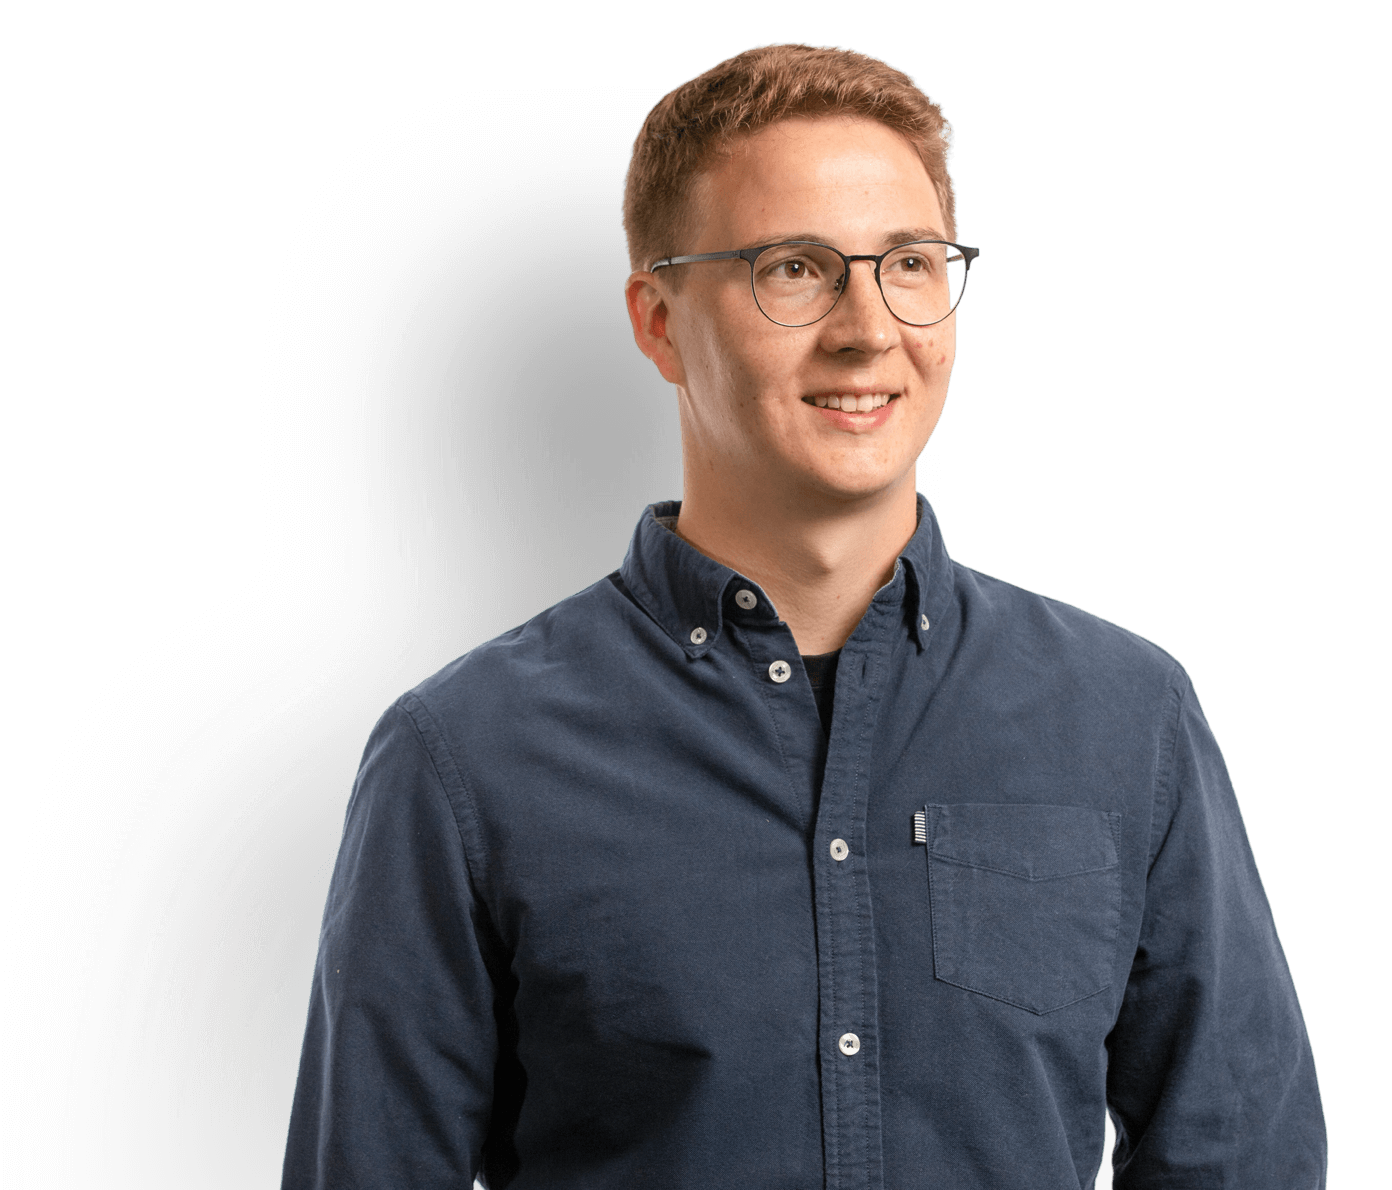 Webdesigner Fabian Raedecke